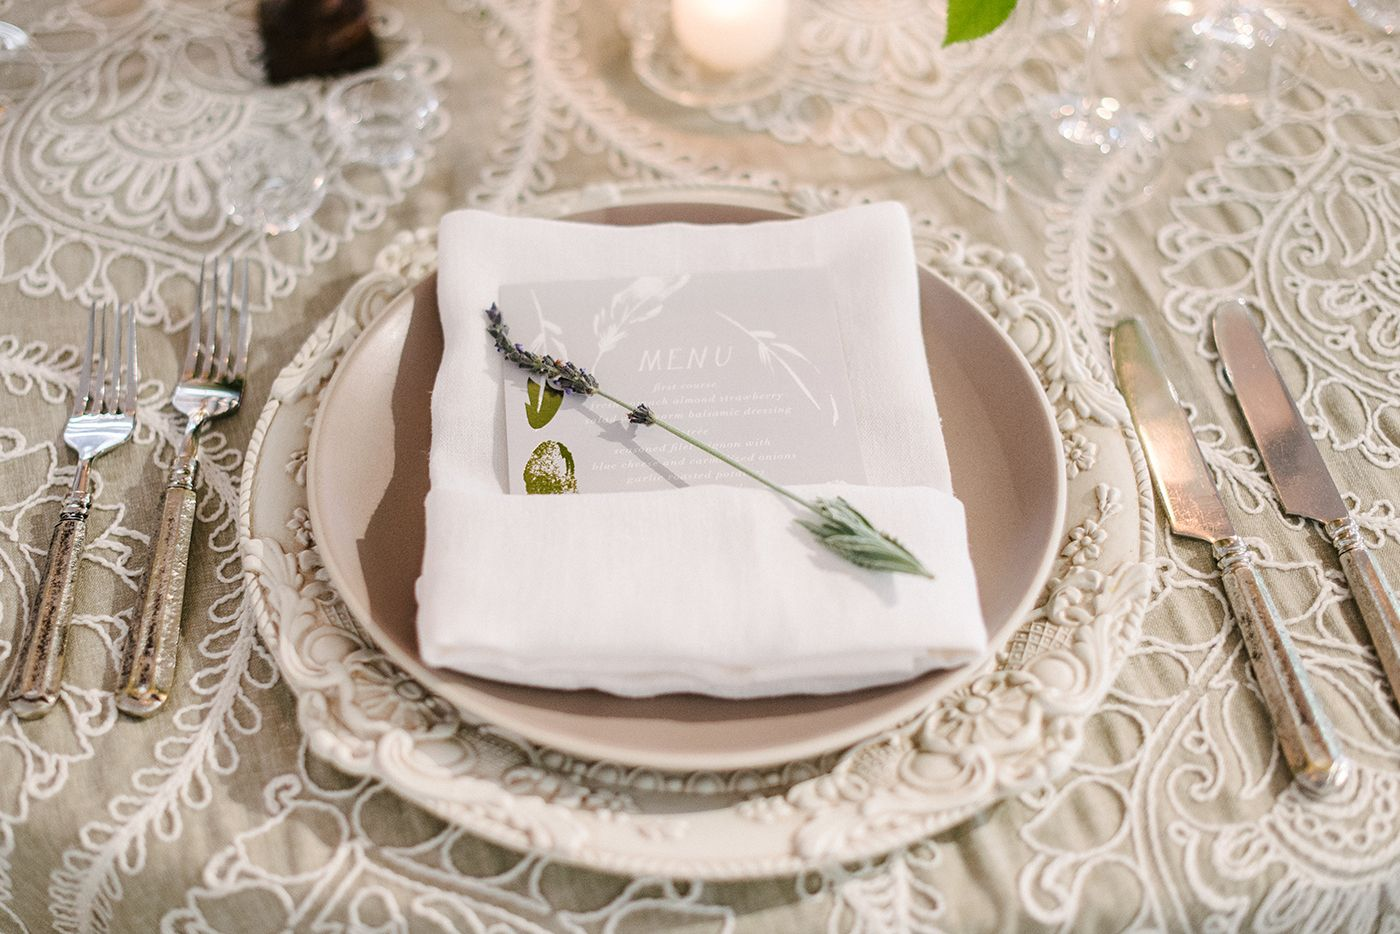 chair cover rental charlotte nc salon covers black la tavola fine linen liv with tuscany white